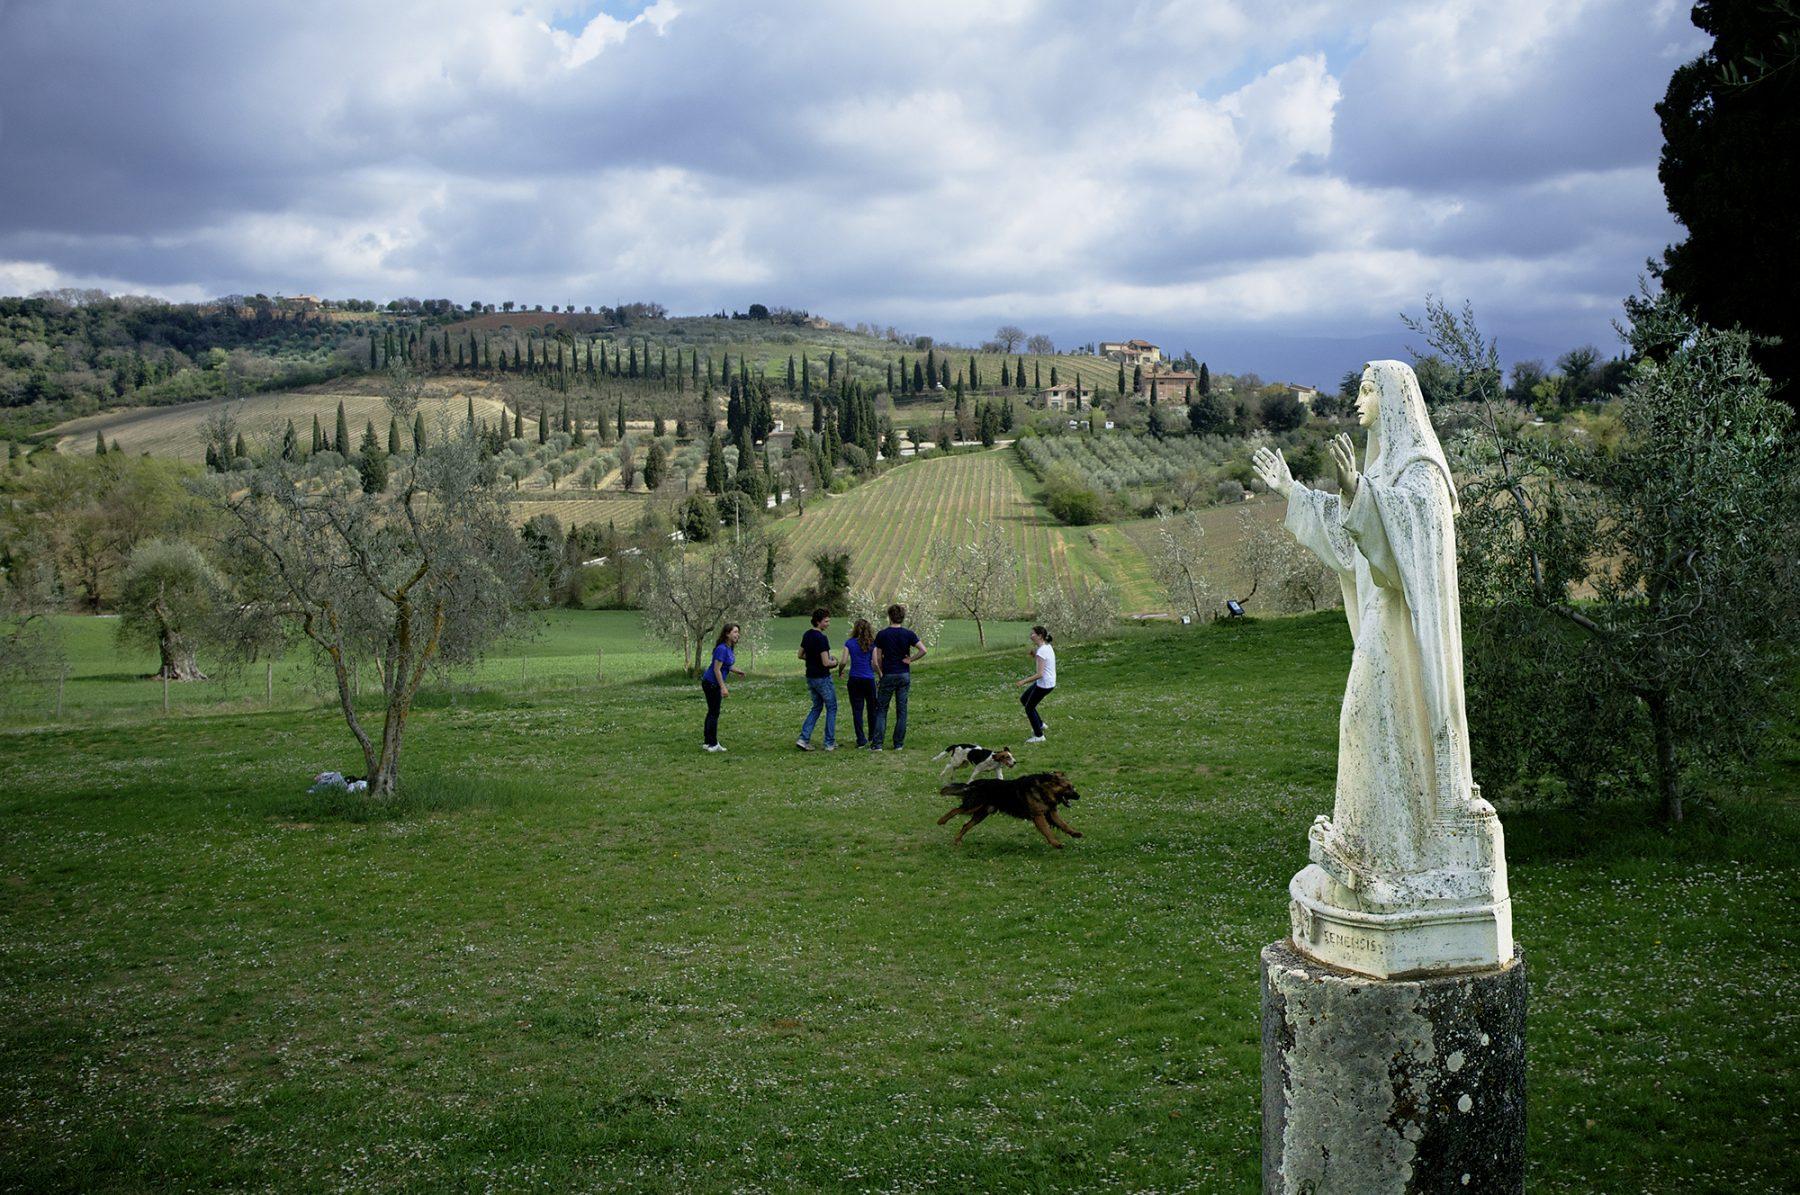 Italien, Toskana, Landschaft, Steinmadonna, junge Menschen